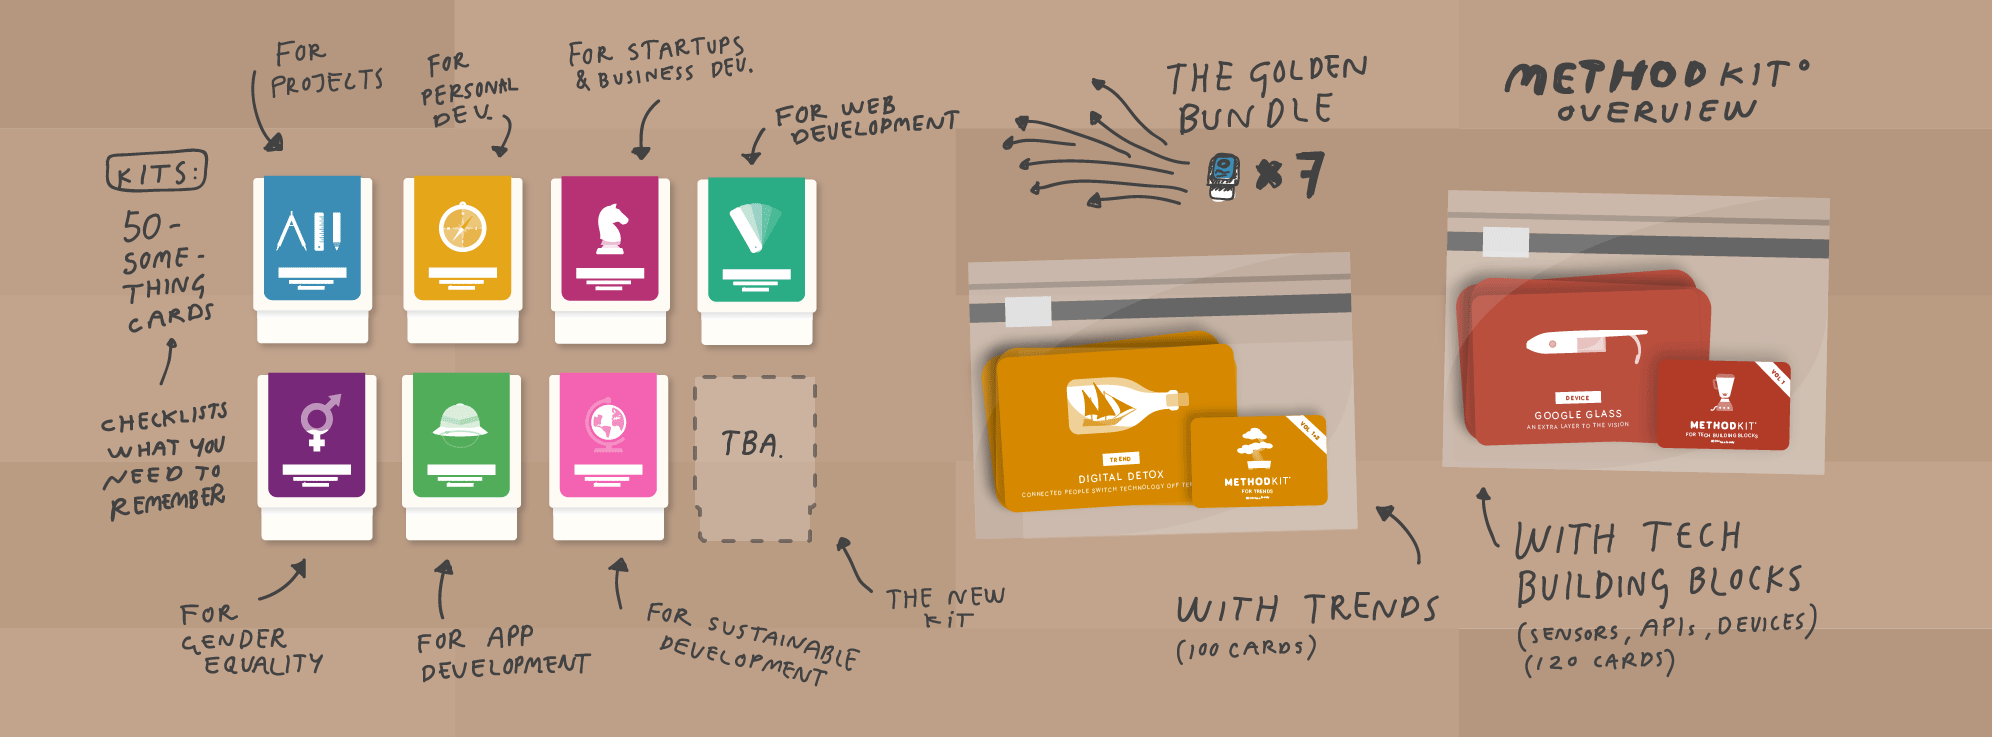 MethodKit Types Startups, App Development, Projects